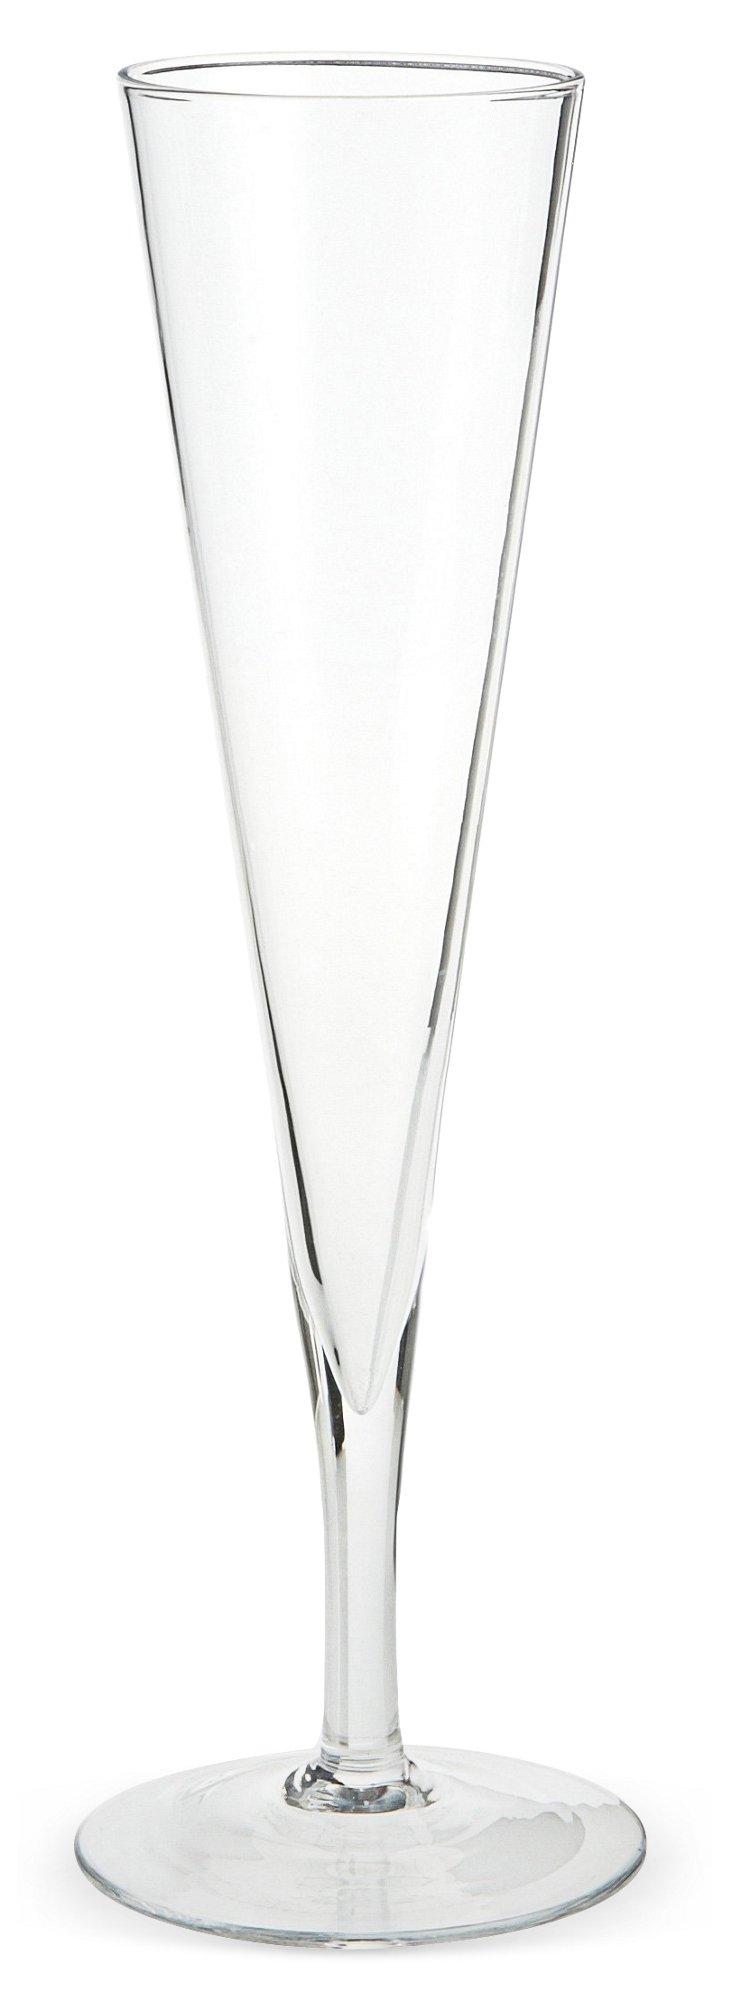 S/6 Vintage-Style Champagne Flutes